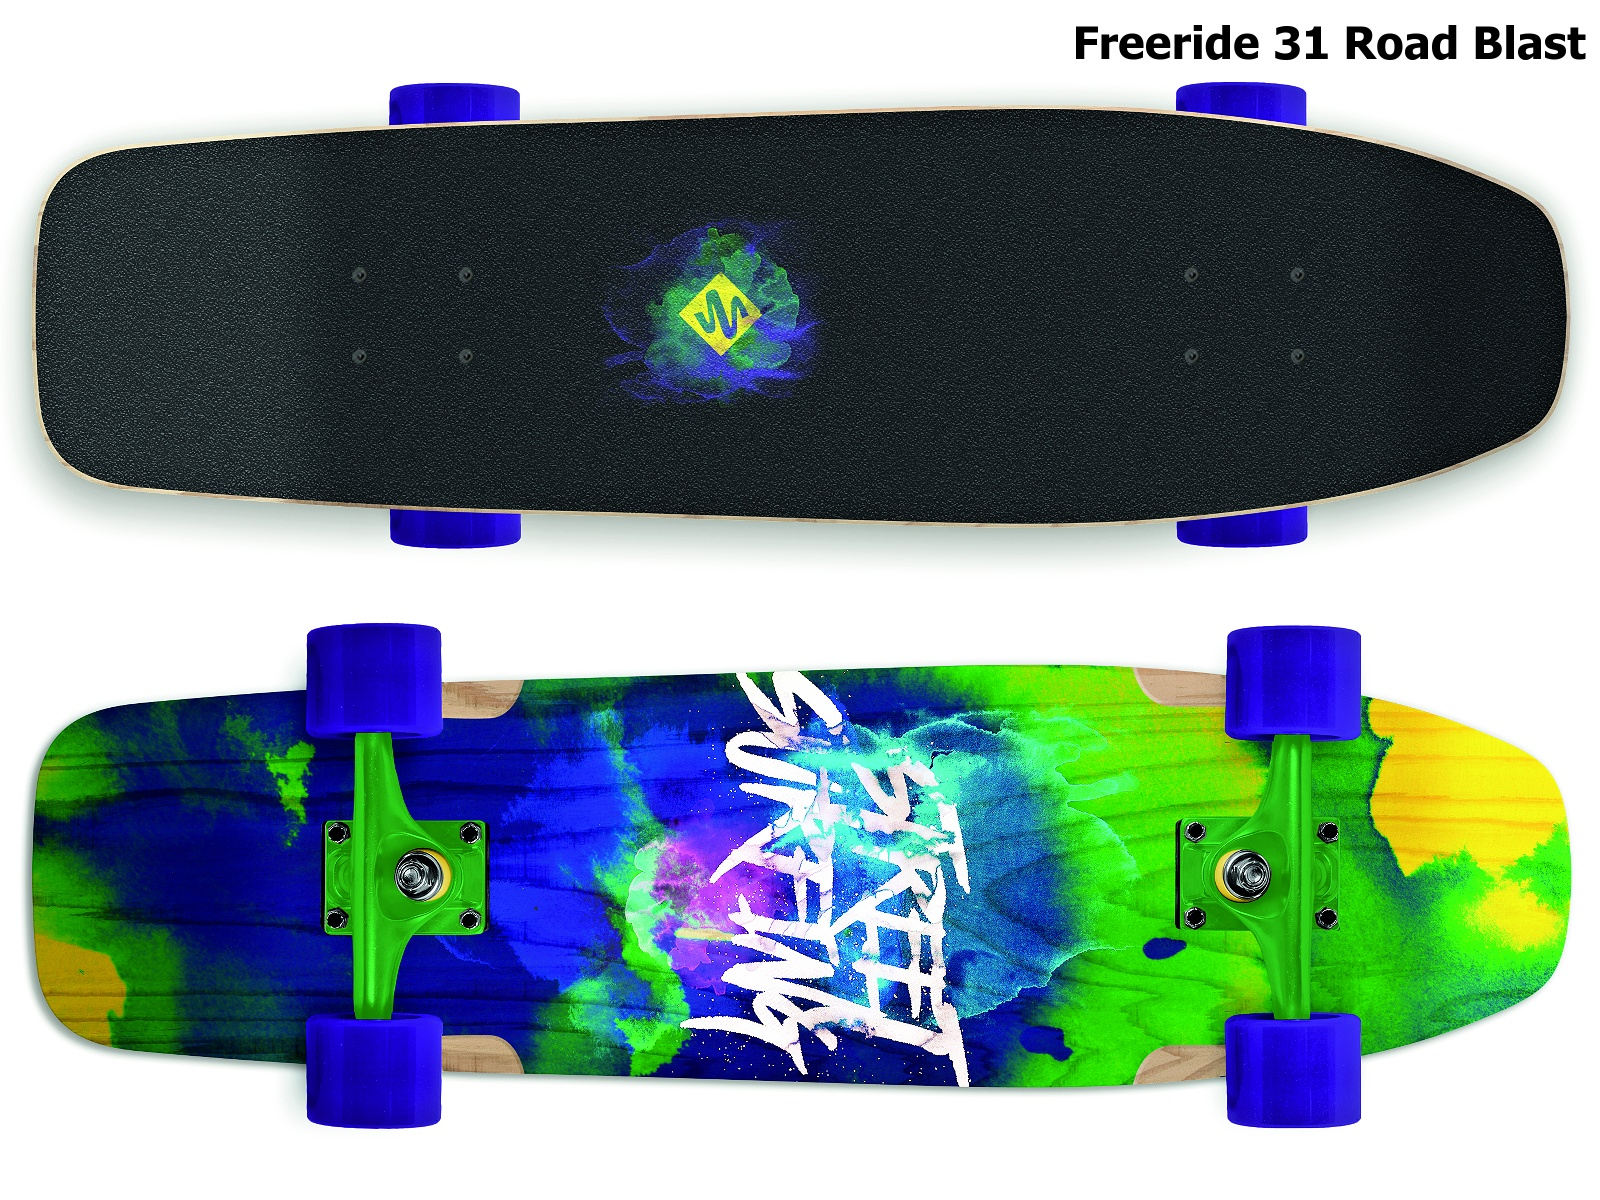 Skateboard STREET SURFING Freeride 31 Road Blast